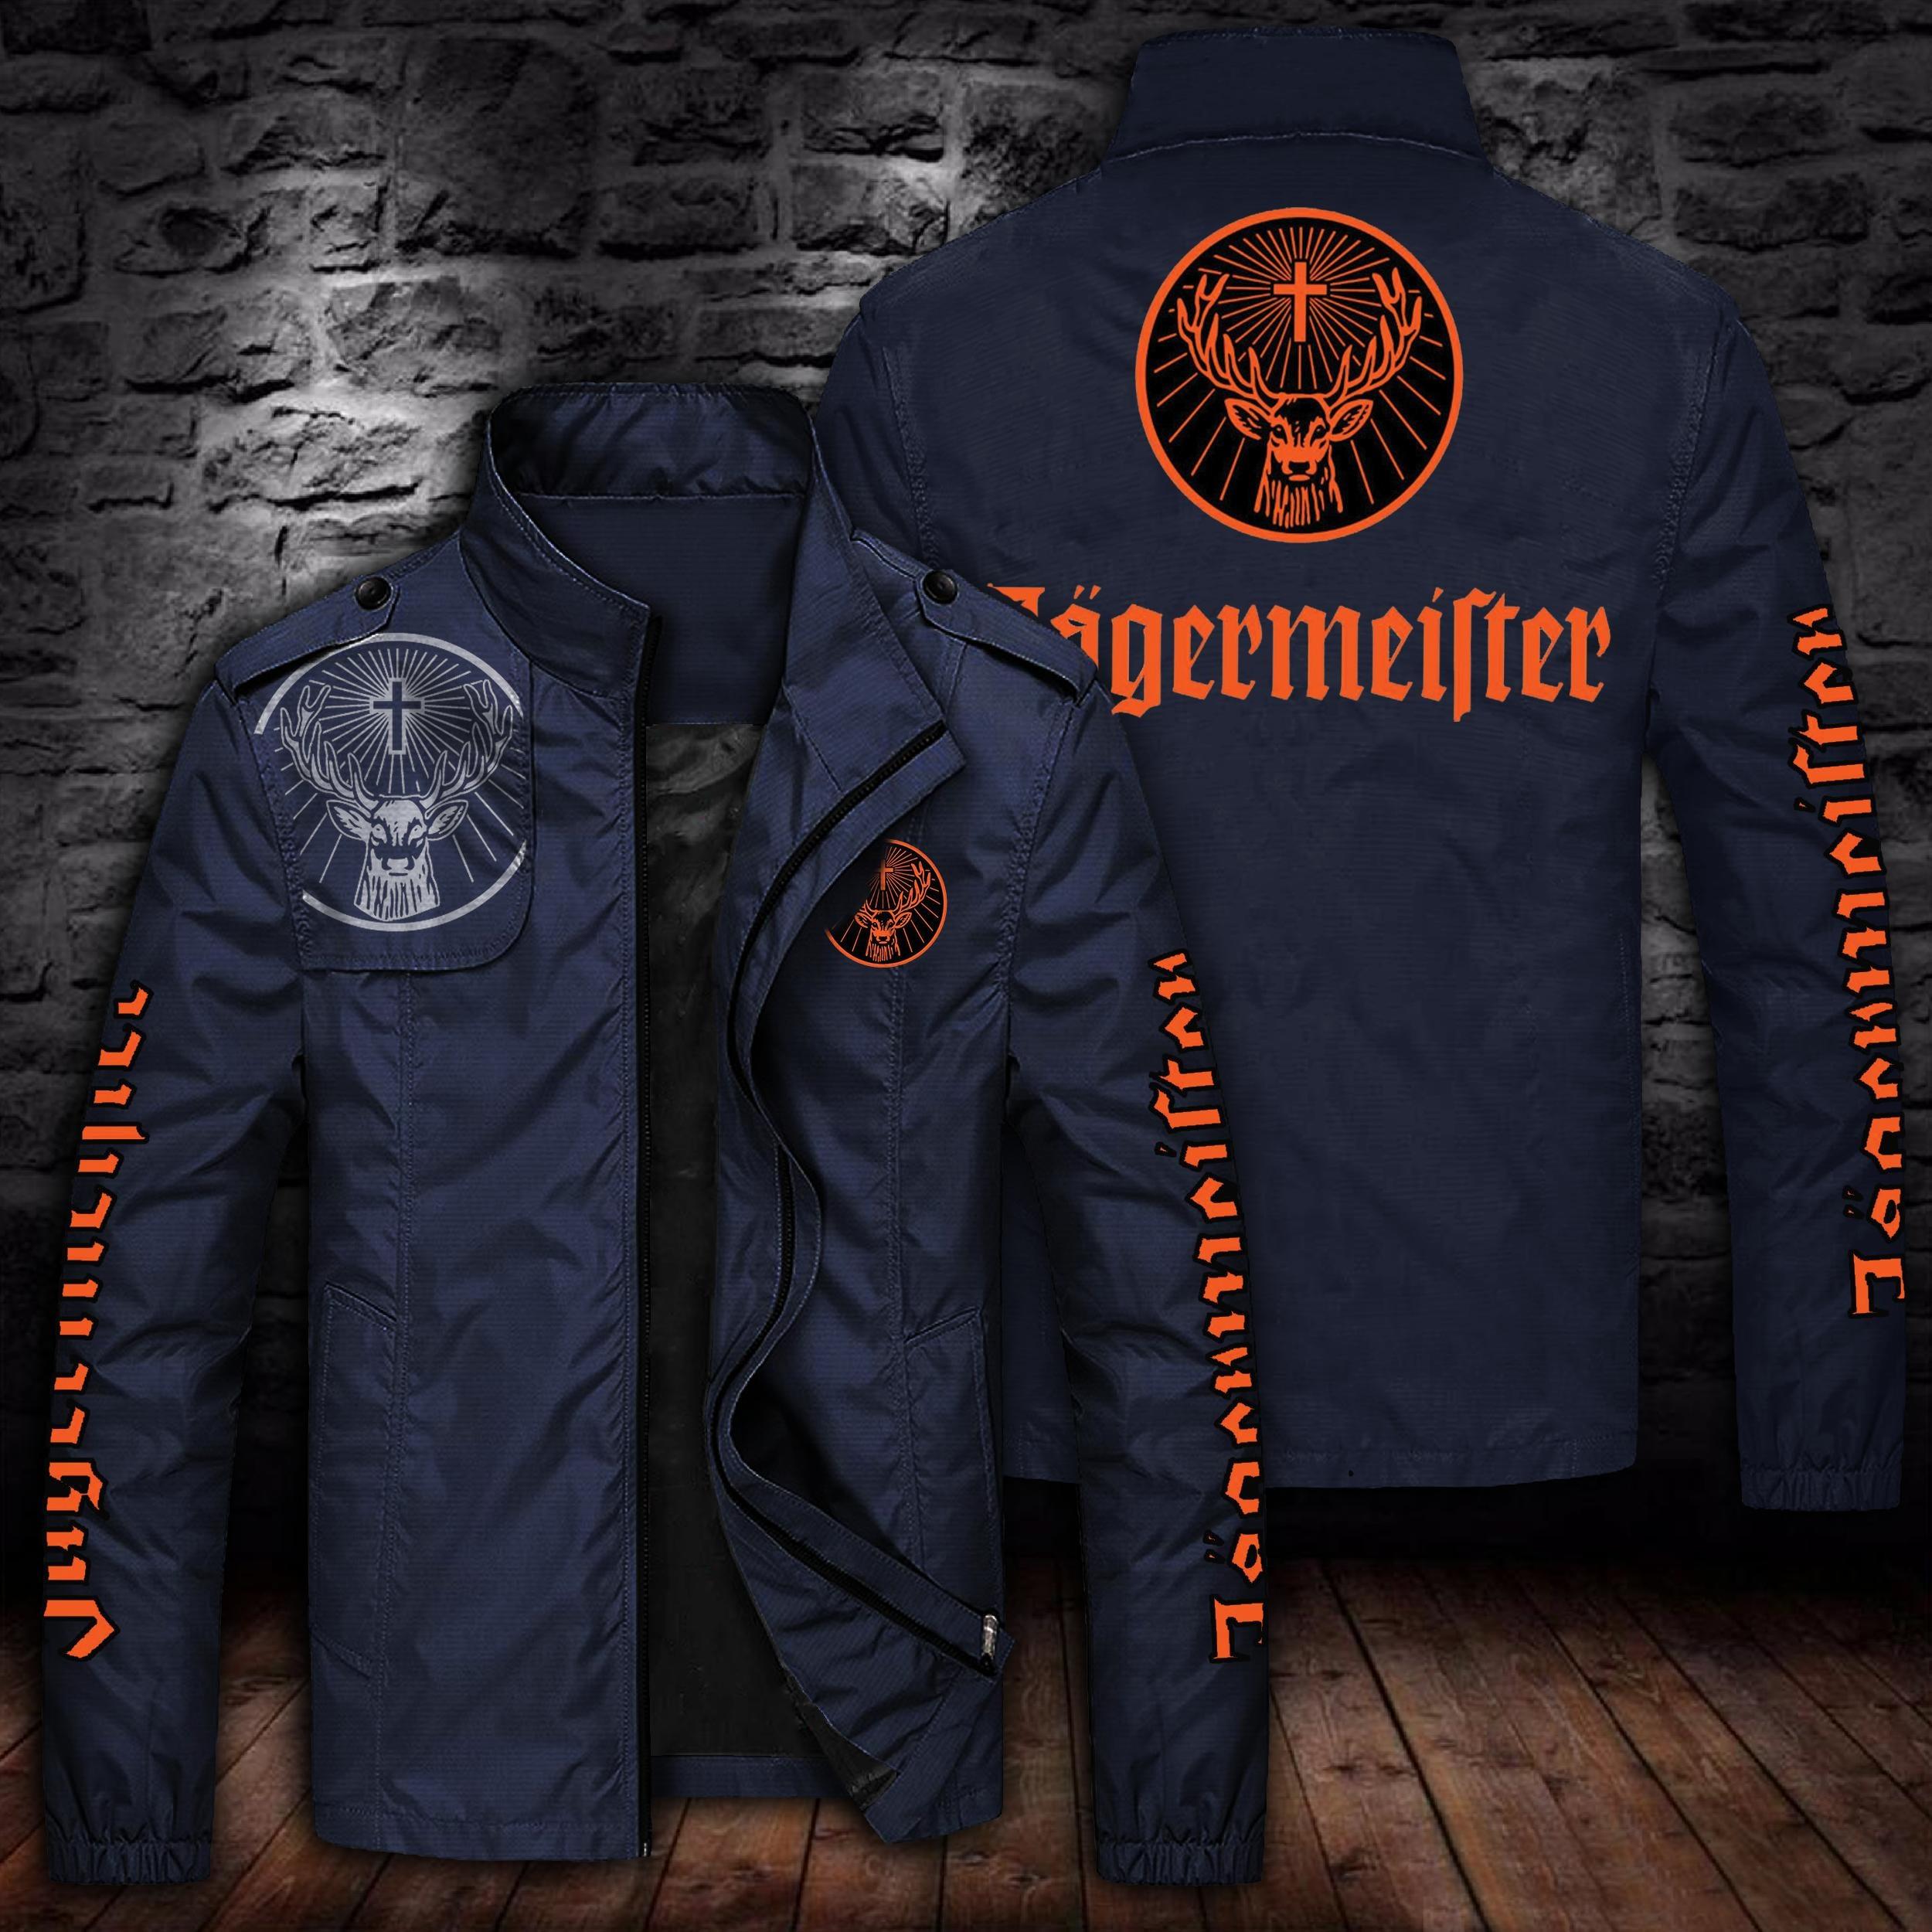 Jagermeister 3D full print jackets